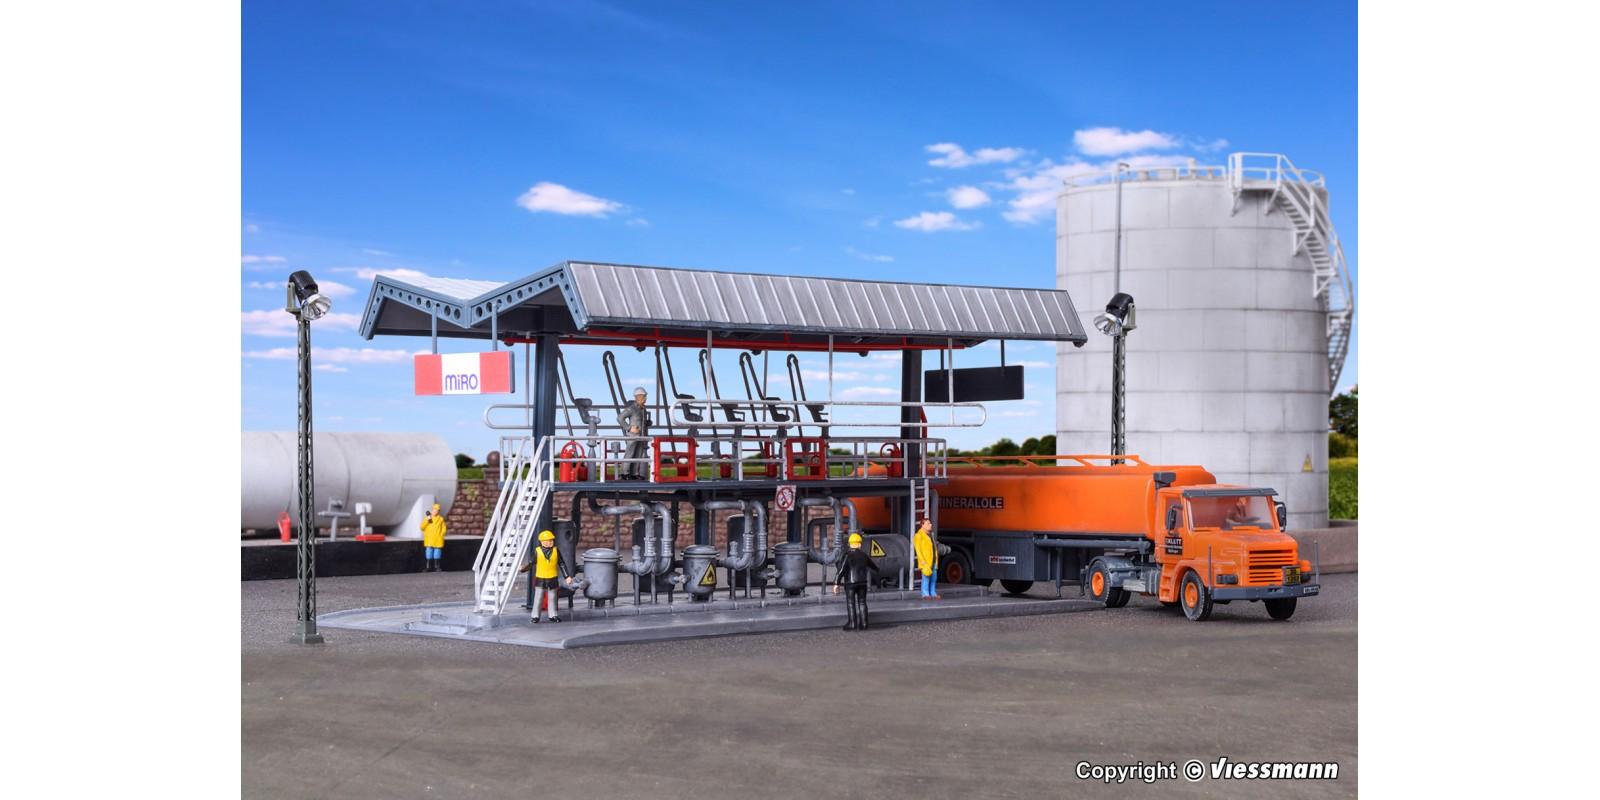 KI39834 MIRO filling station with SCANIA road tanker